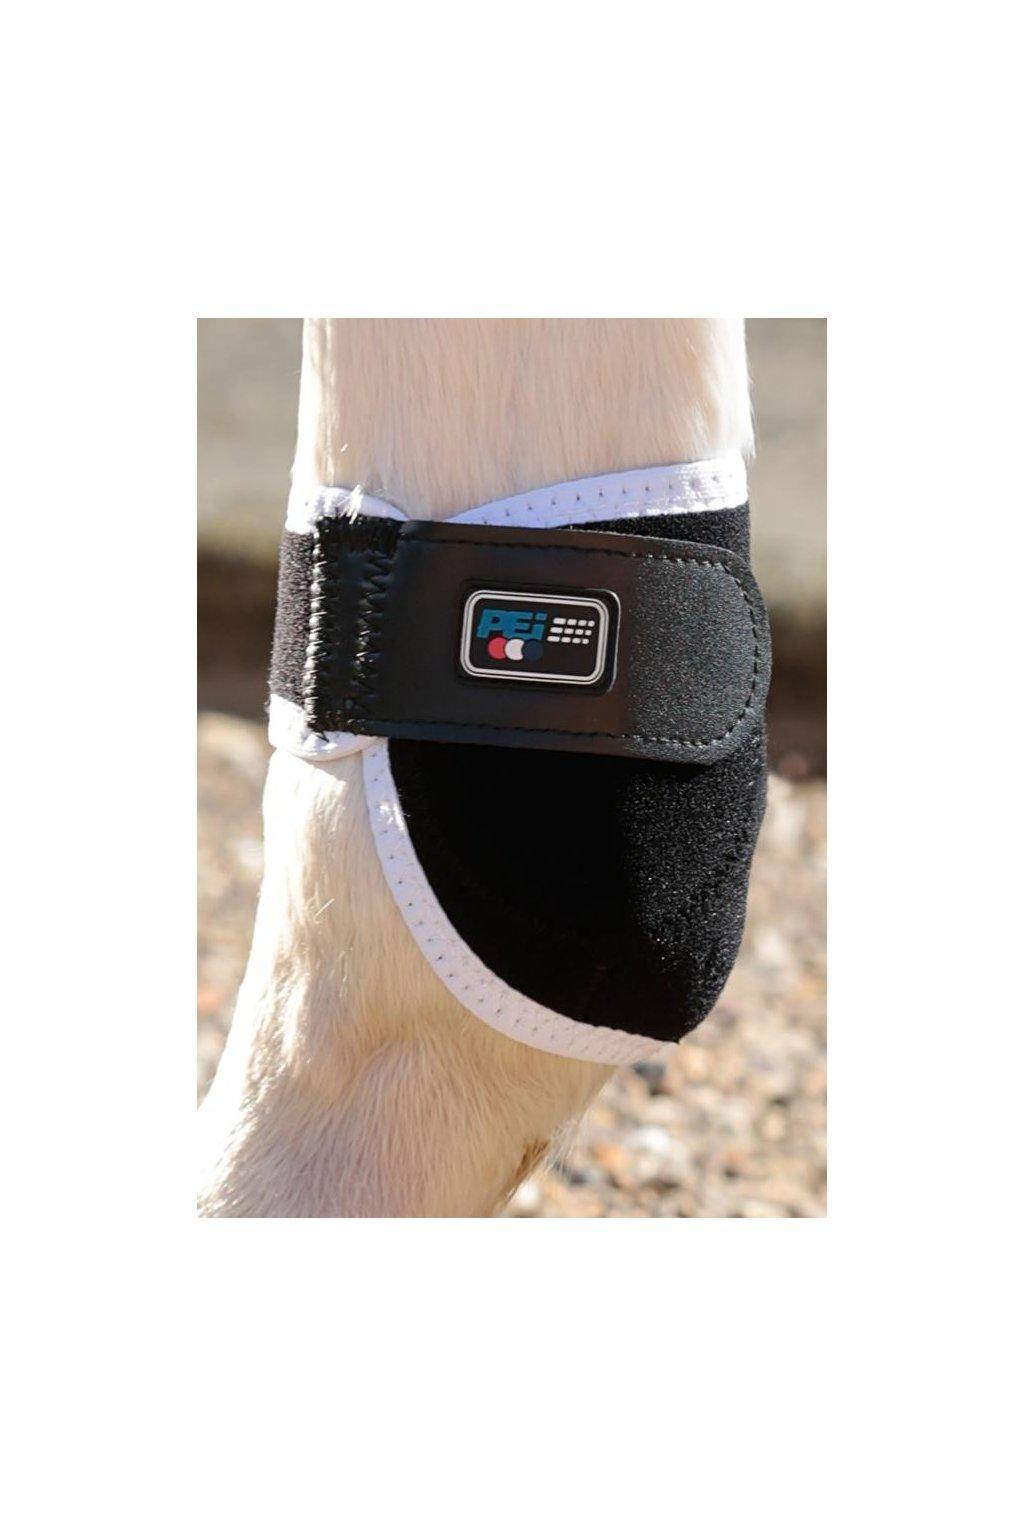 Magnetické kamaše na zadní nohy Magni-Teque Premier Equine